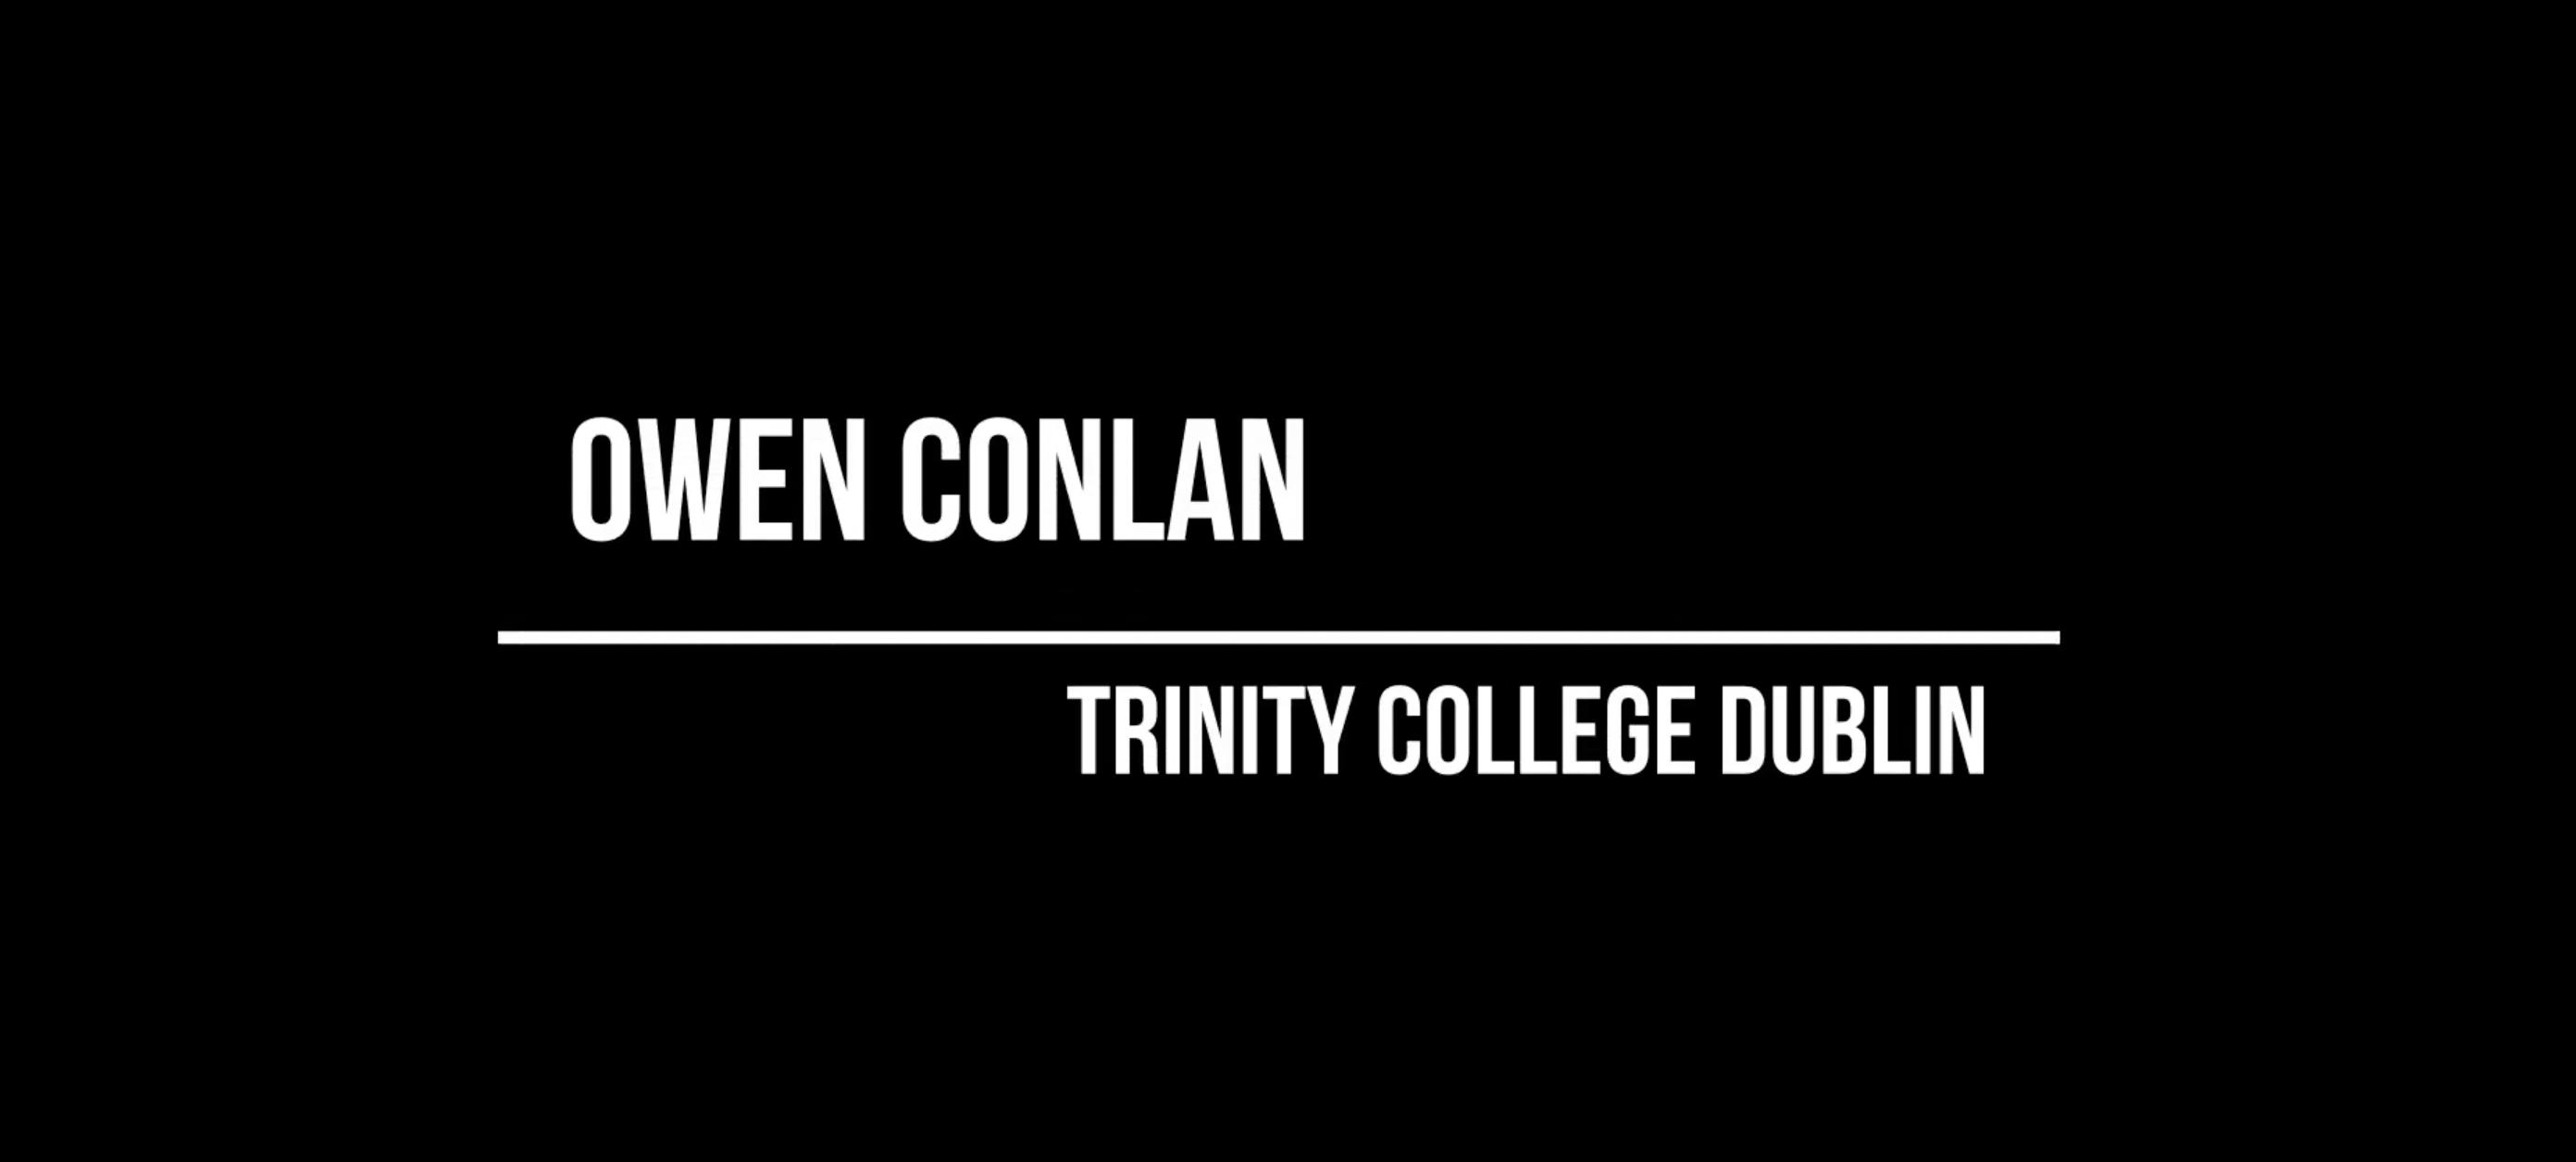 Workshop 1 – Owen Conlan – Fostering Reflection & Serendipity in Heterogeneous Digital Collections